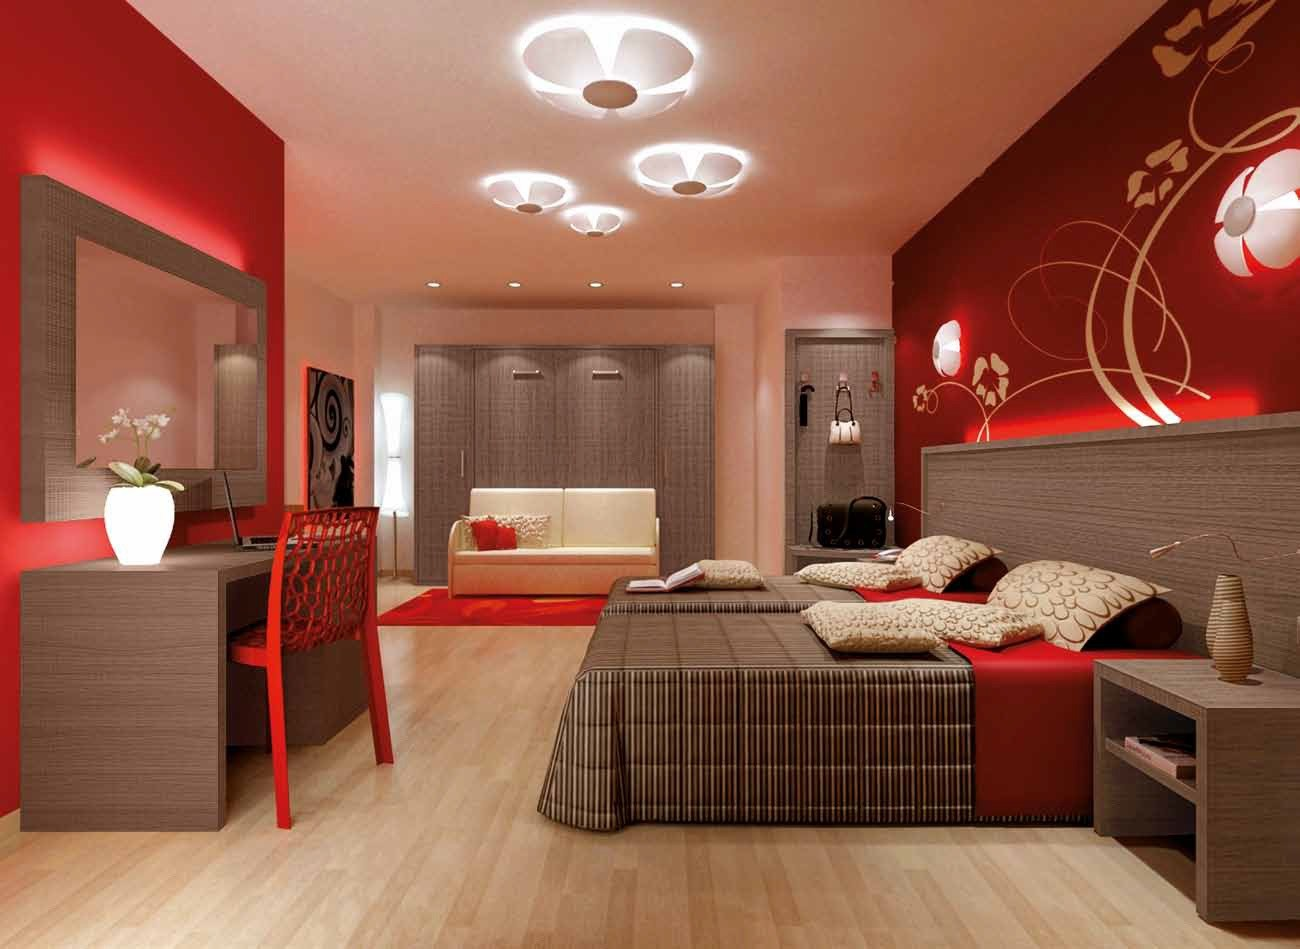 Arredamento stile moderno jq53 regardsdefemmes - Arredamento interni design ...